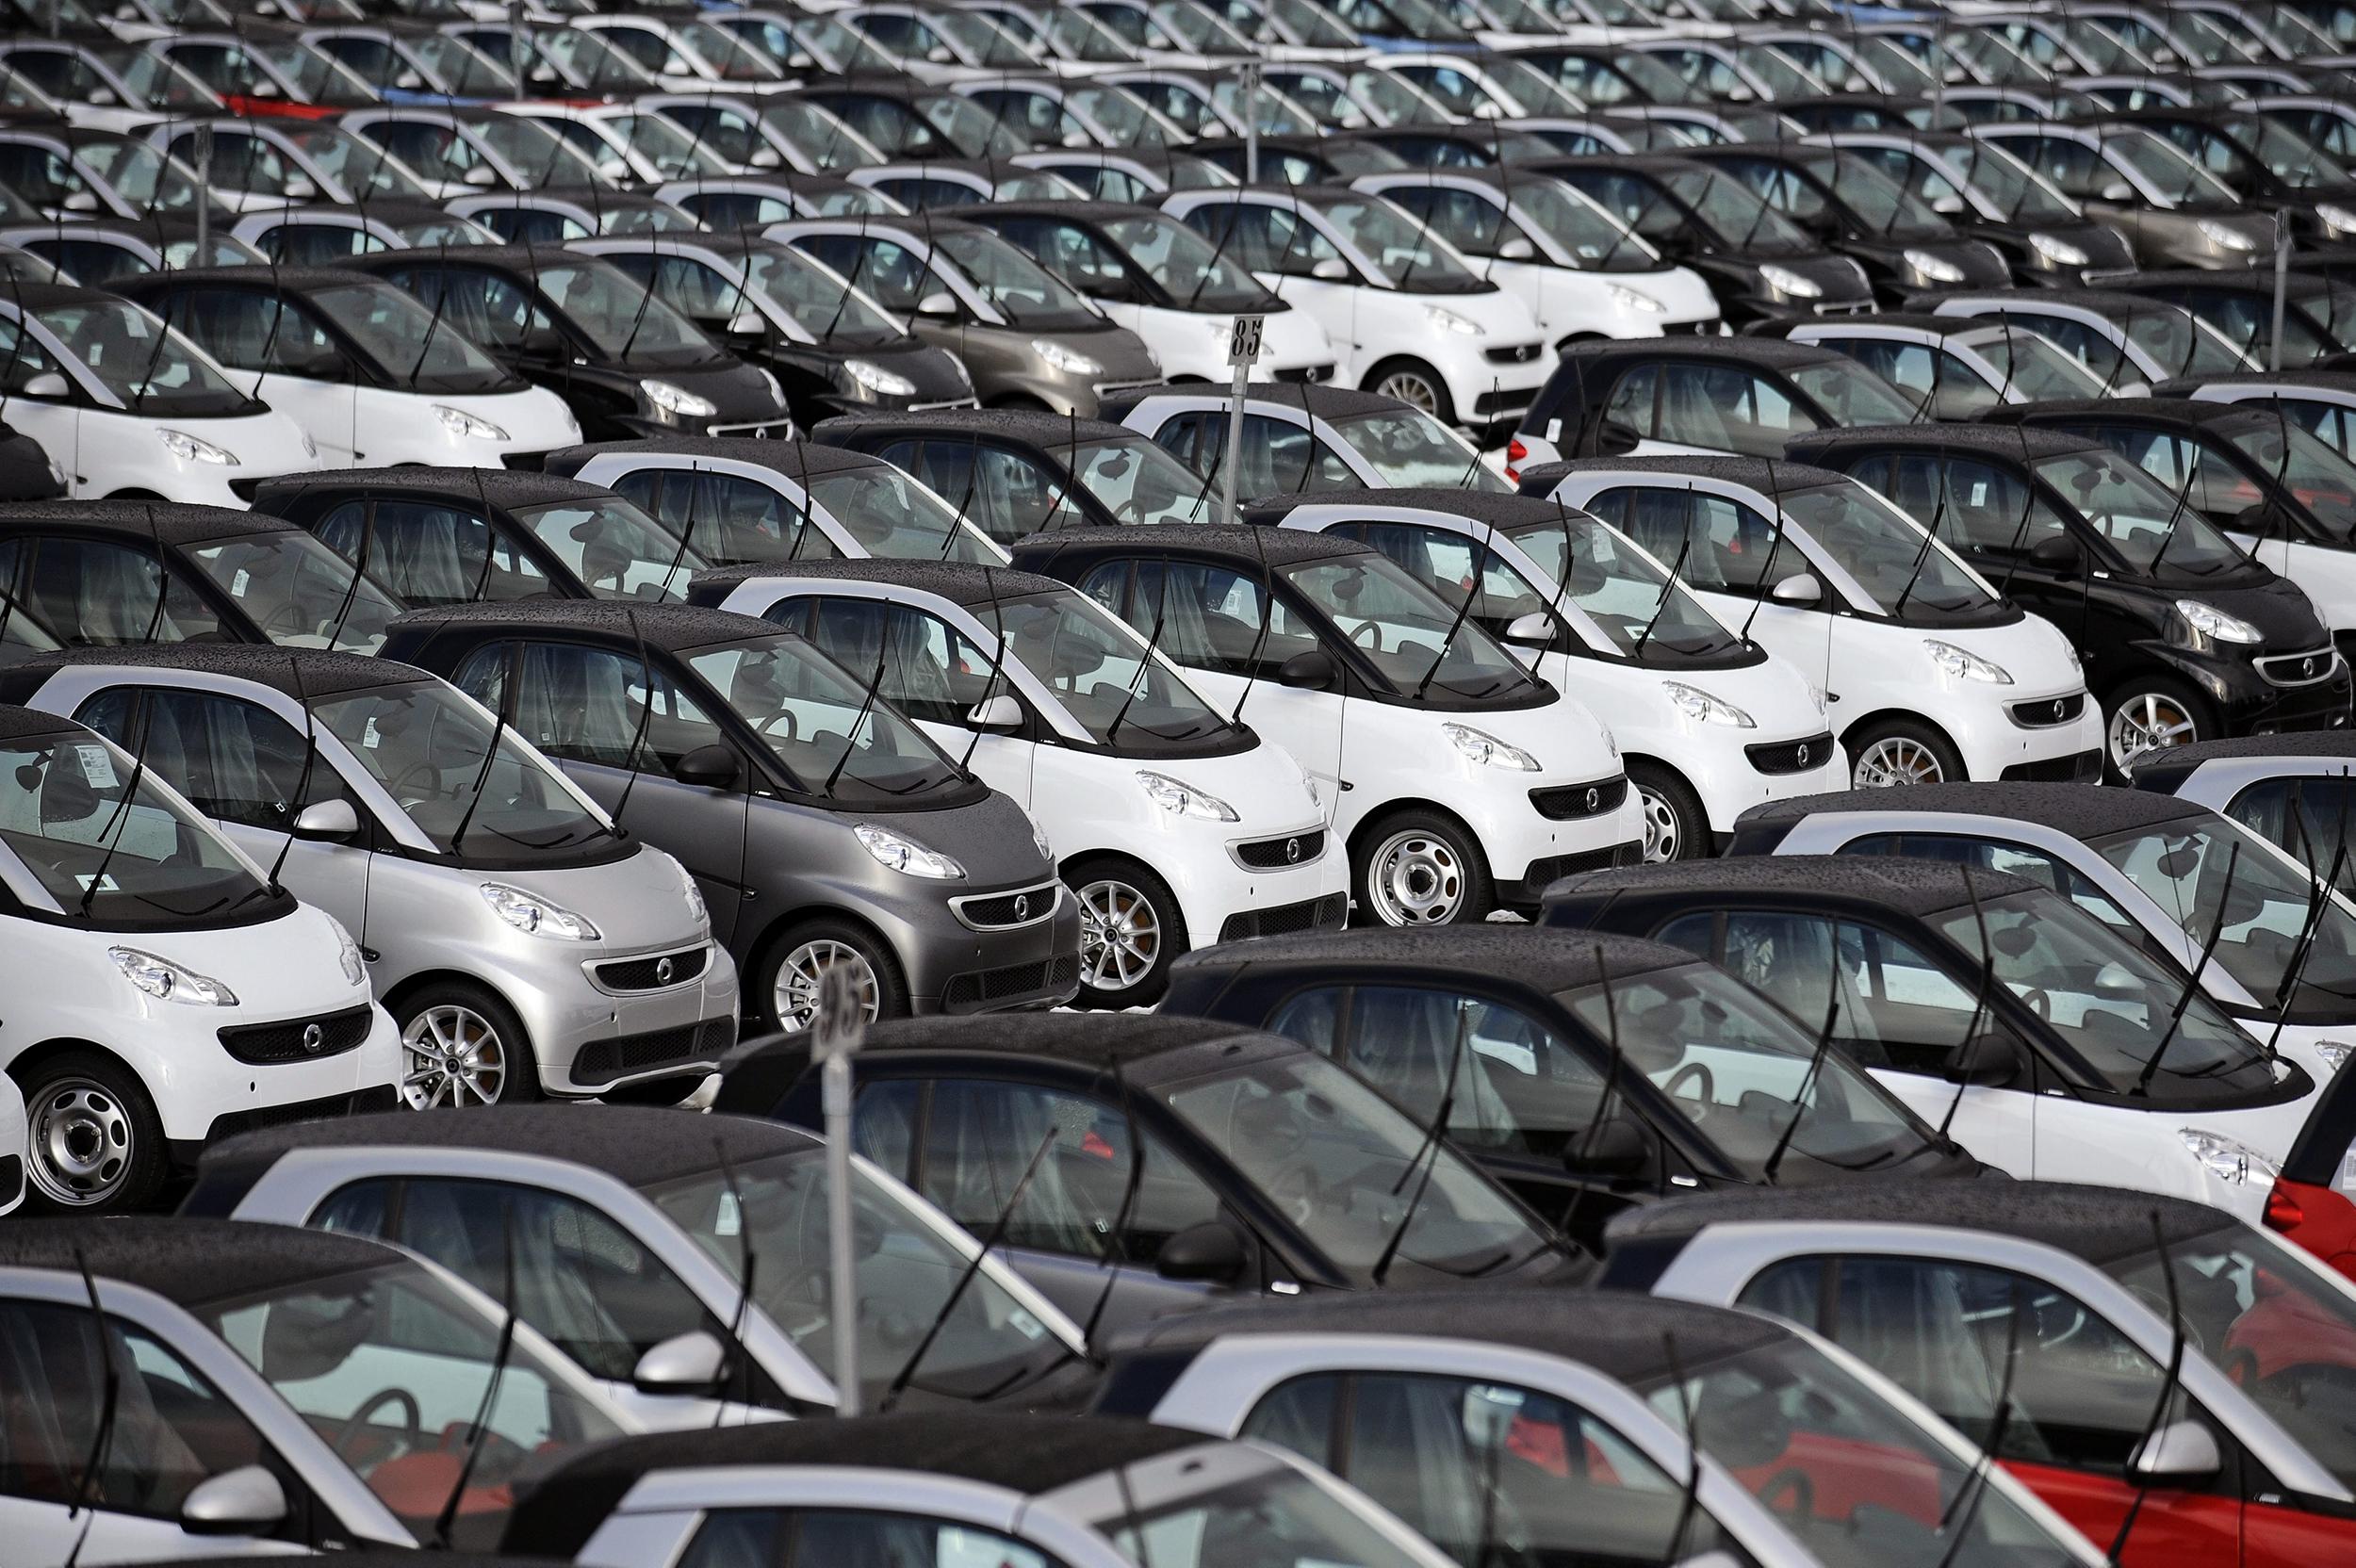 Think Small, Aim High: Smart Car Pins Hopes on New Microcar Models